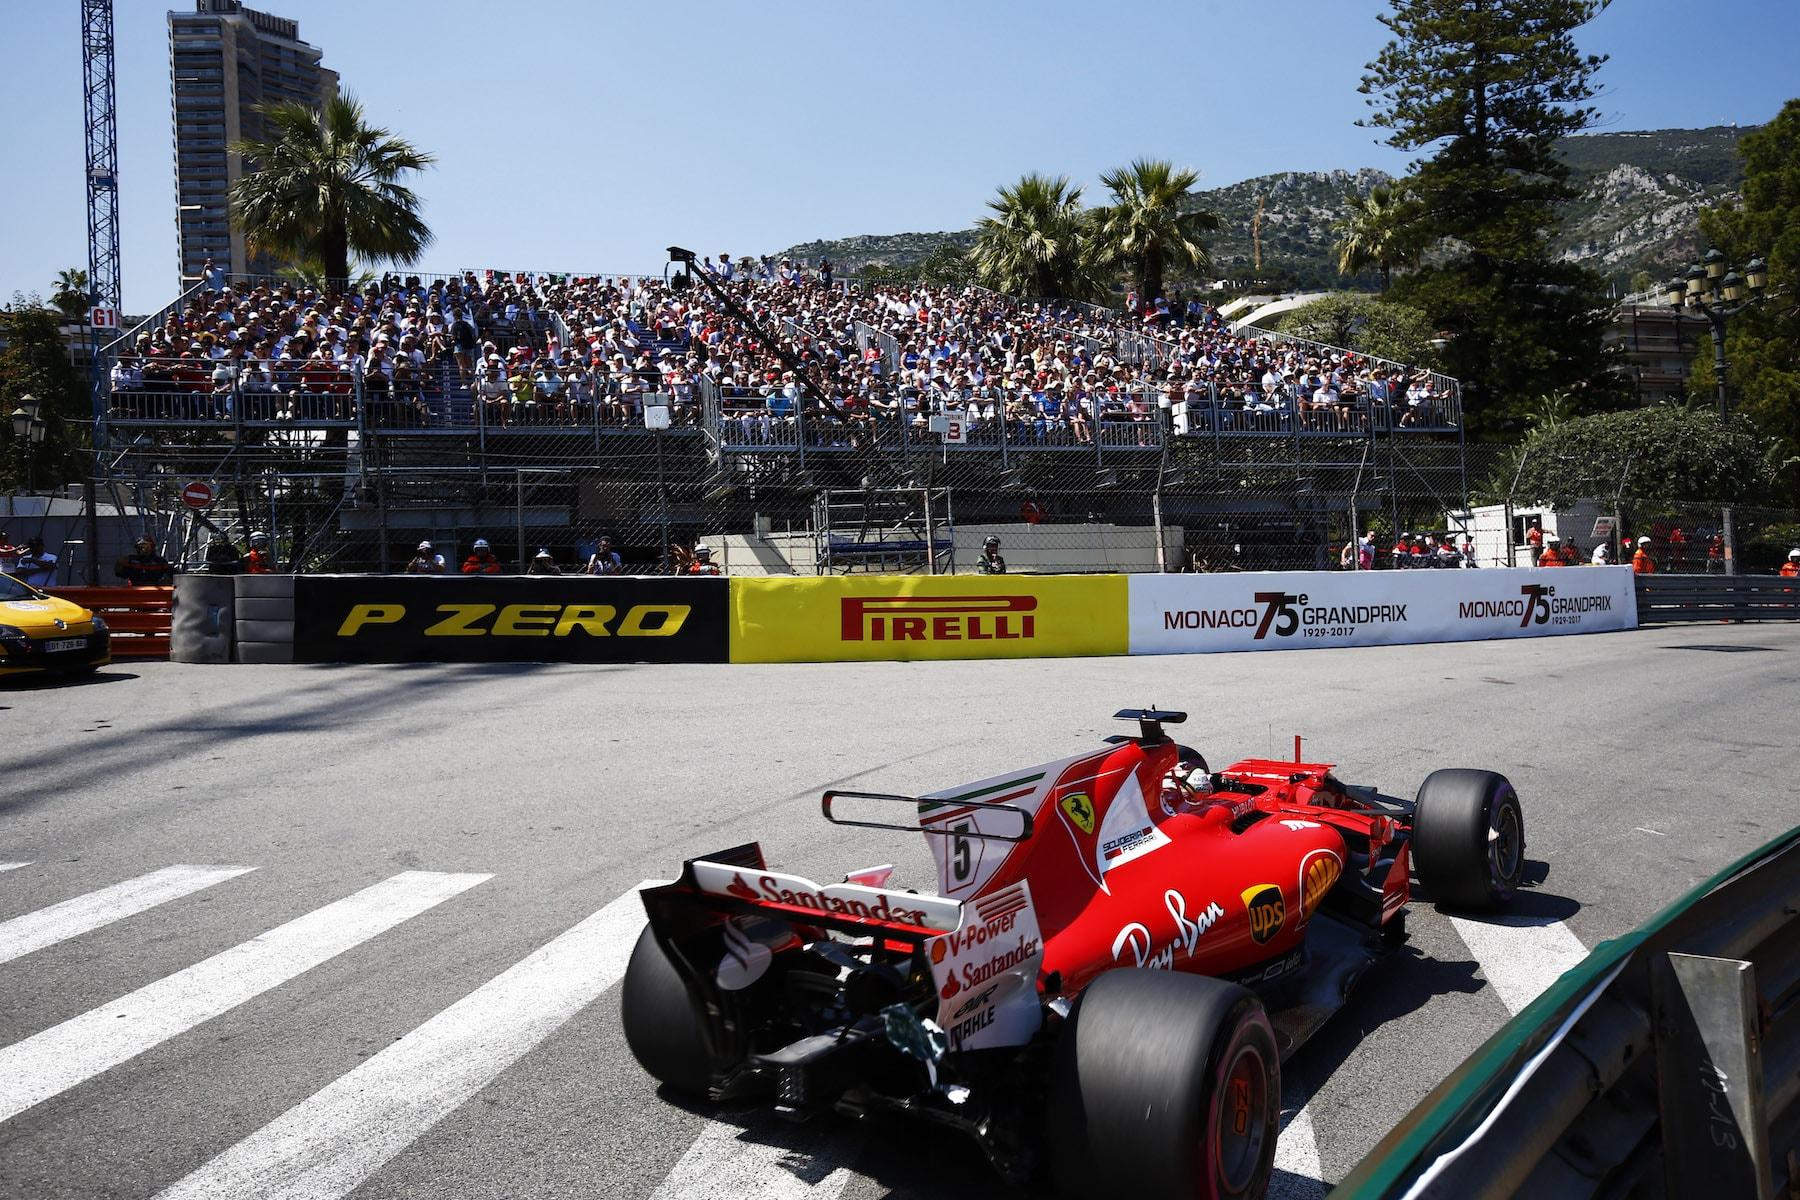 2017 Sebastian Vettel | Ferrari SF70H | 2017 Monaco GP Q3 1 copy.jpg